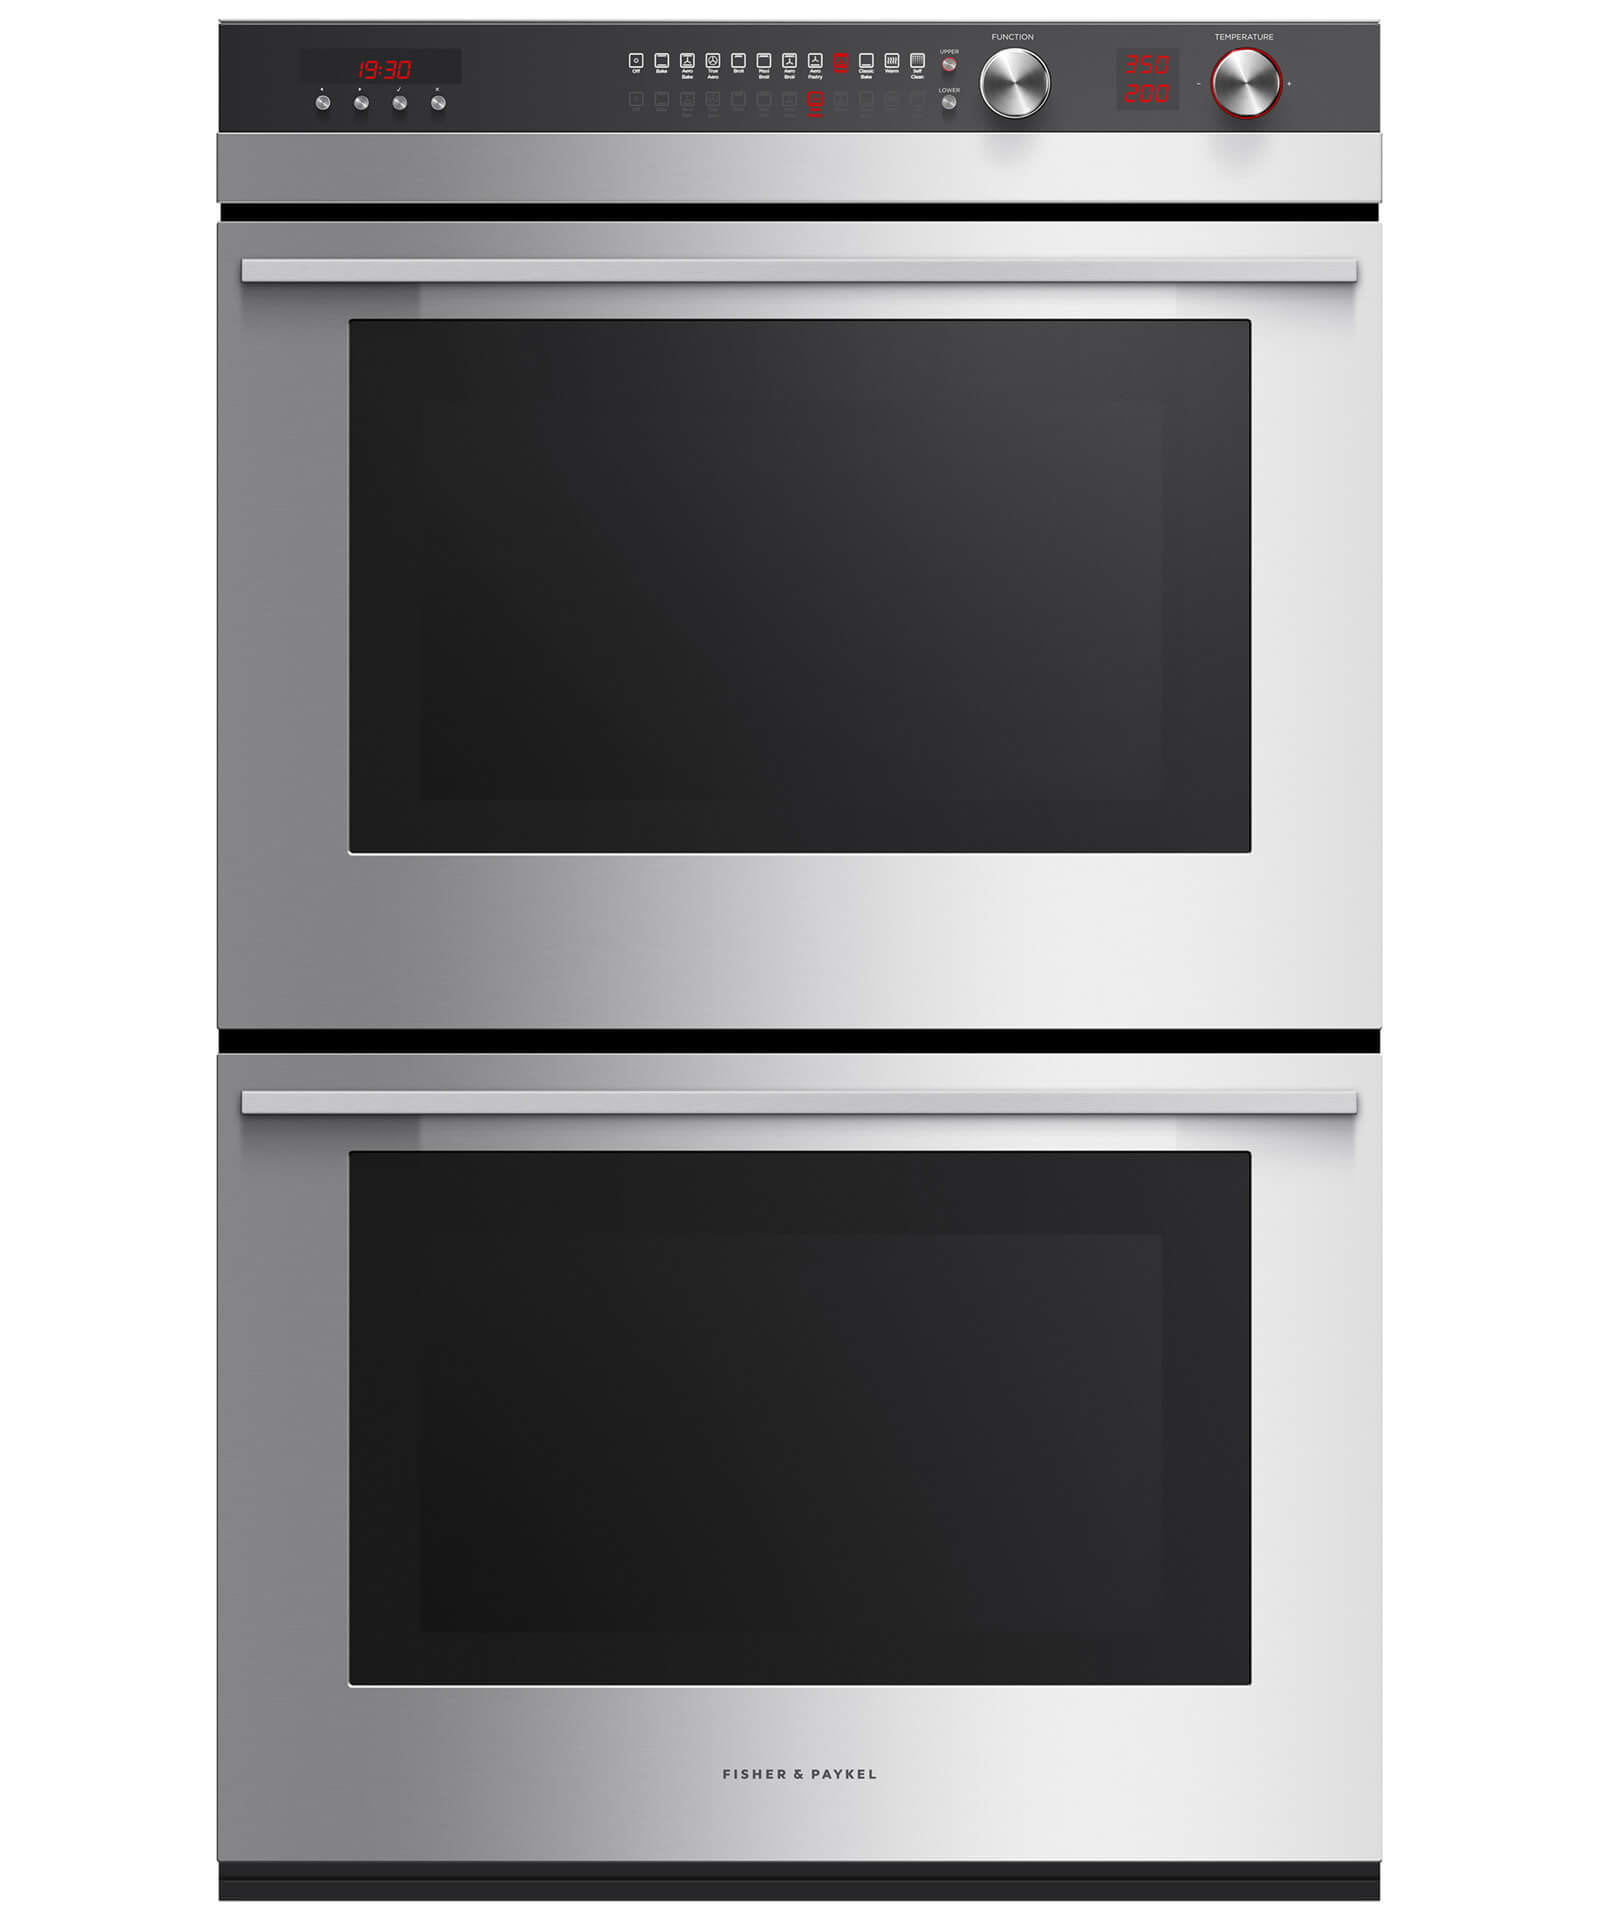 DISPLAY MODEL--Double Built-in Oven, 30 8.2 cu ft, 11 Function